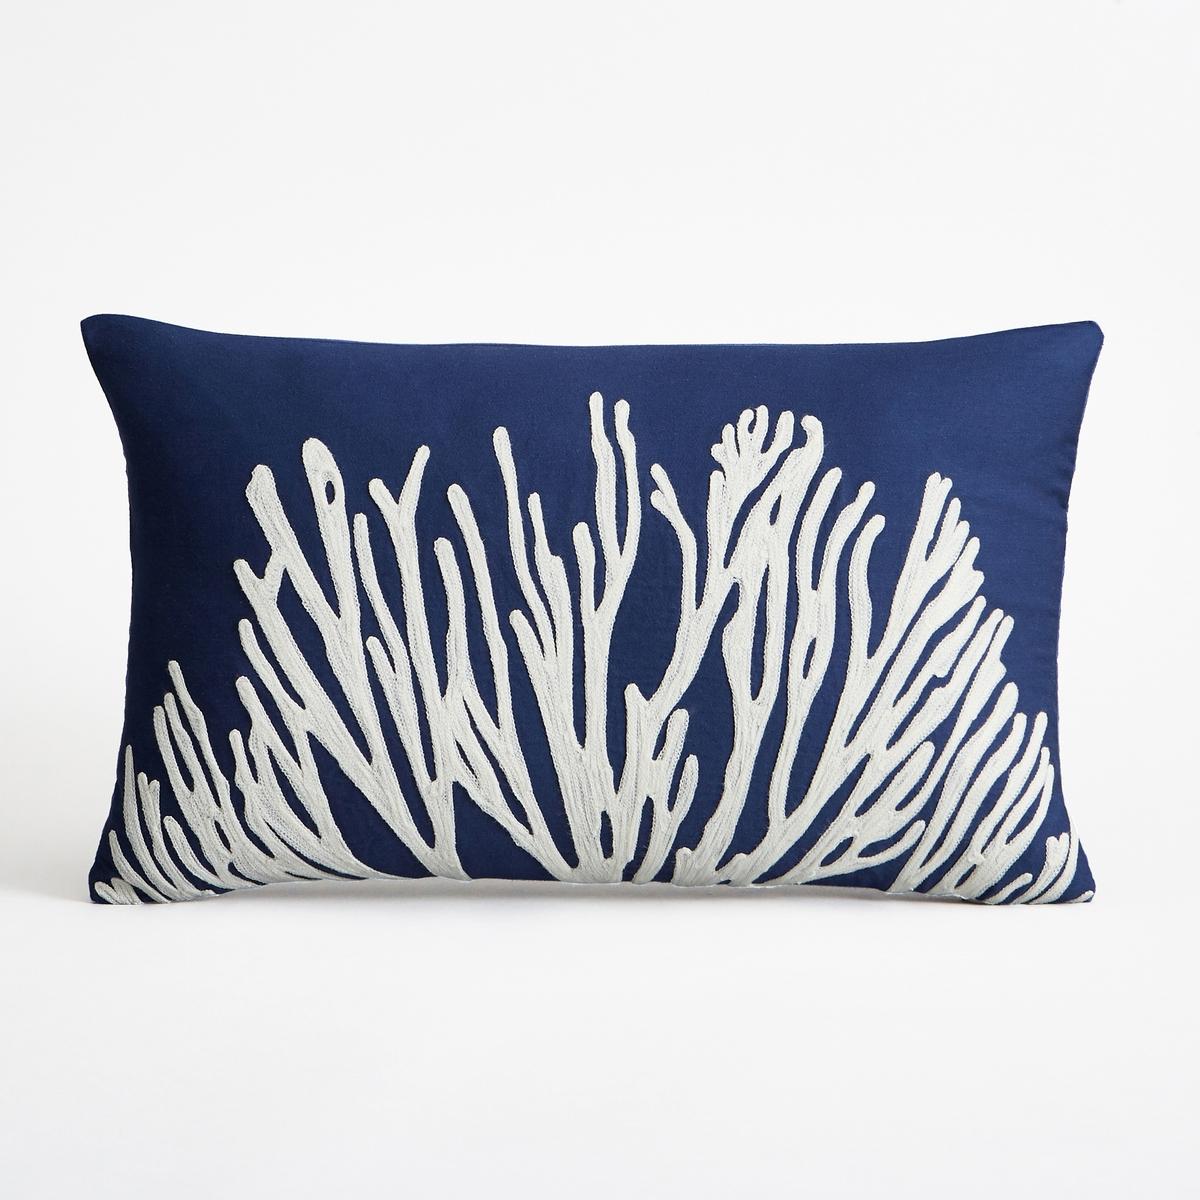 Наволочка на подушку-валик, Mariana<br><br>Цвет: синий морской